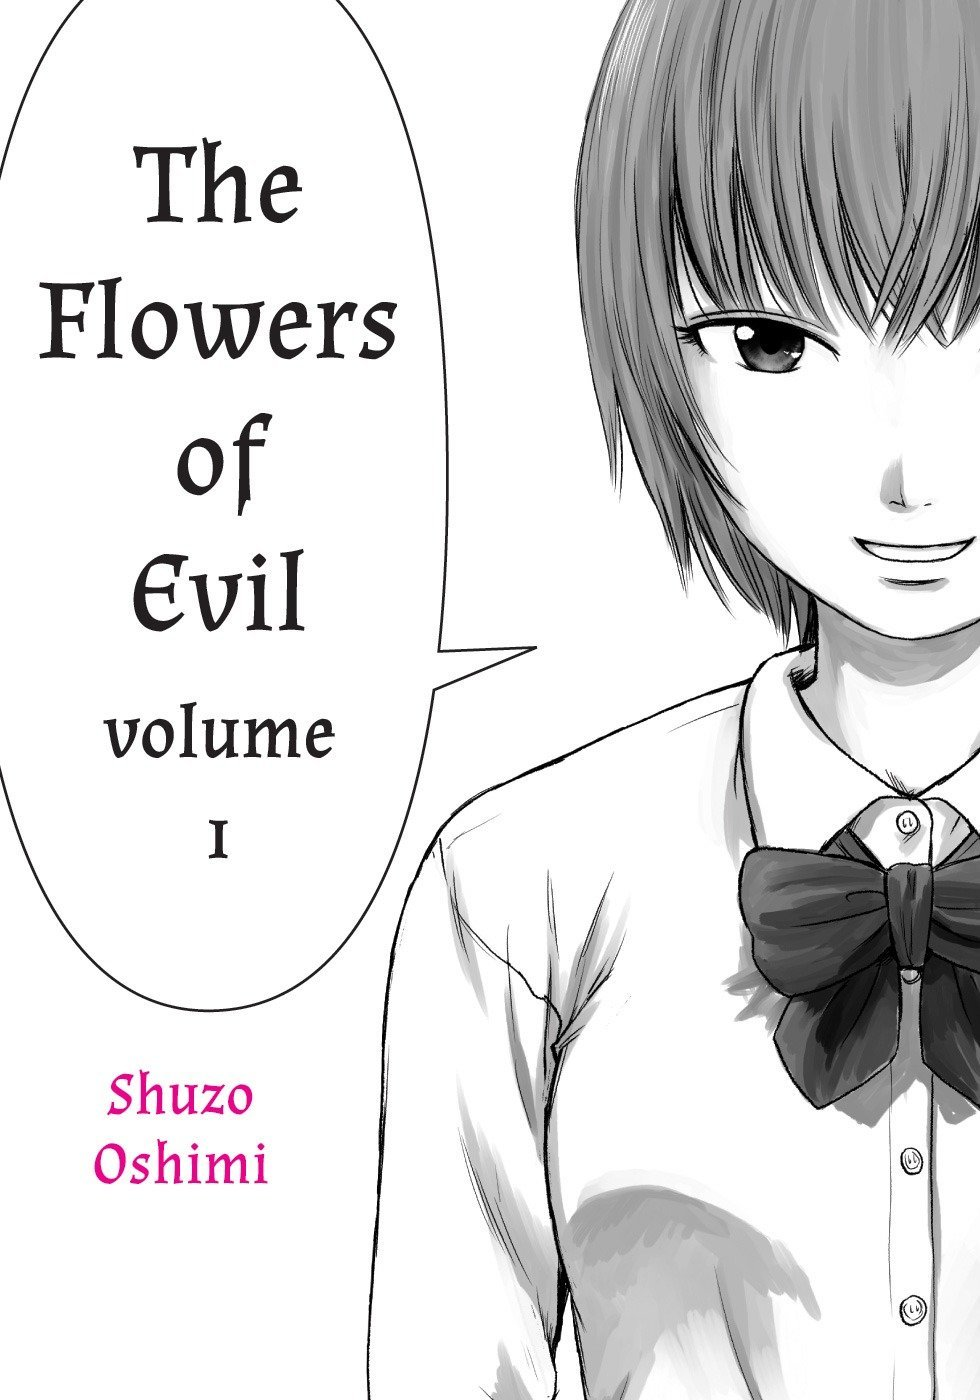 Flowers of Evil, Volume 1 Shuzo Oshimi 9781935654469